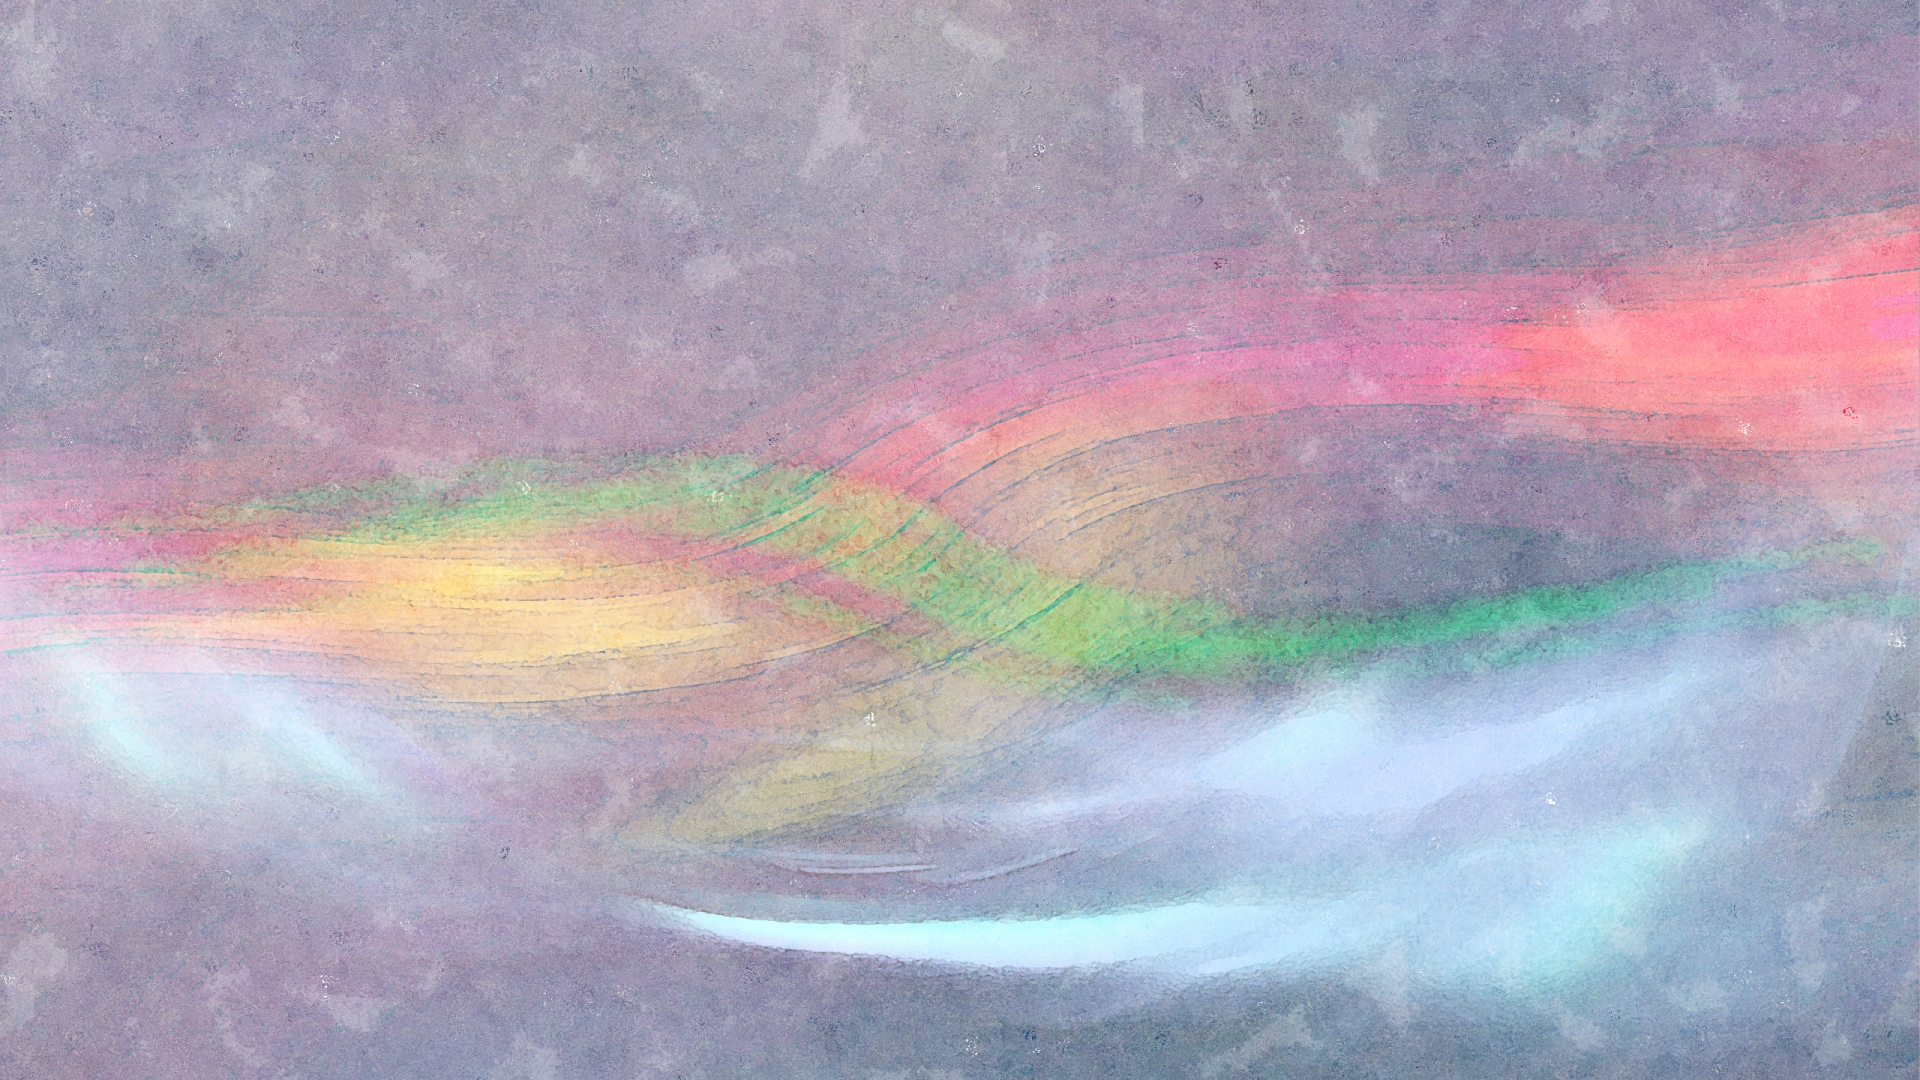 Download pastel painted wallpaper HD wallpaper 1920x1080